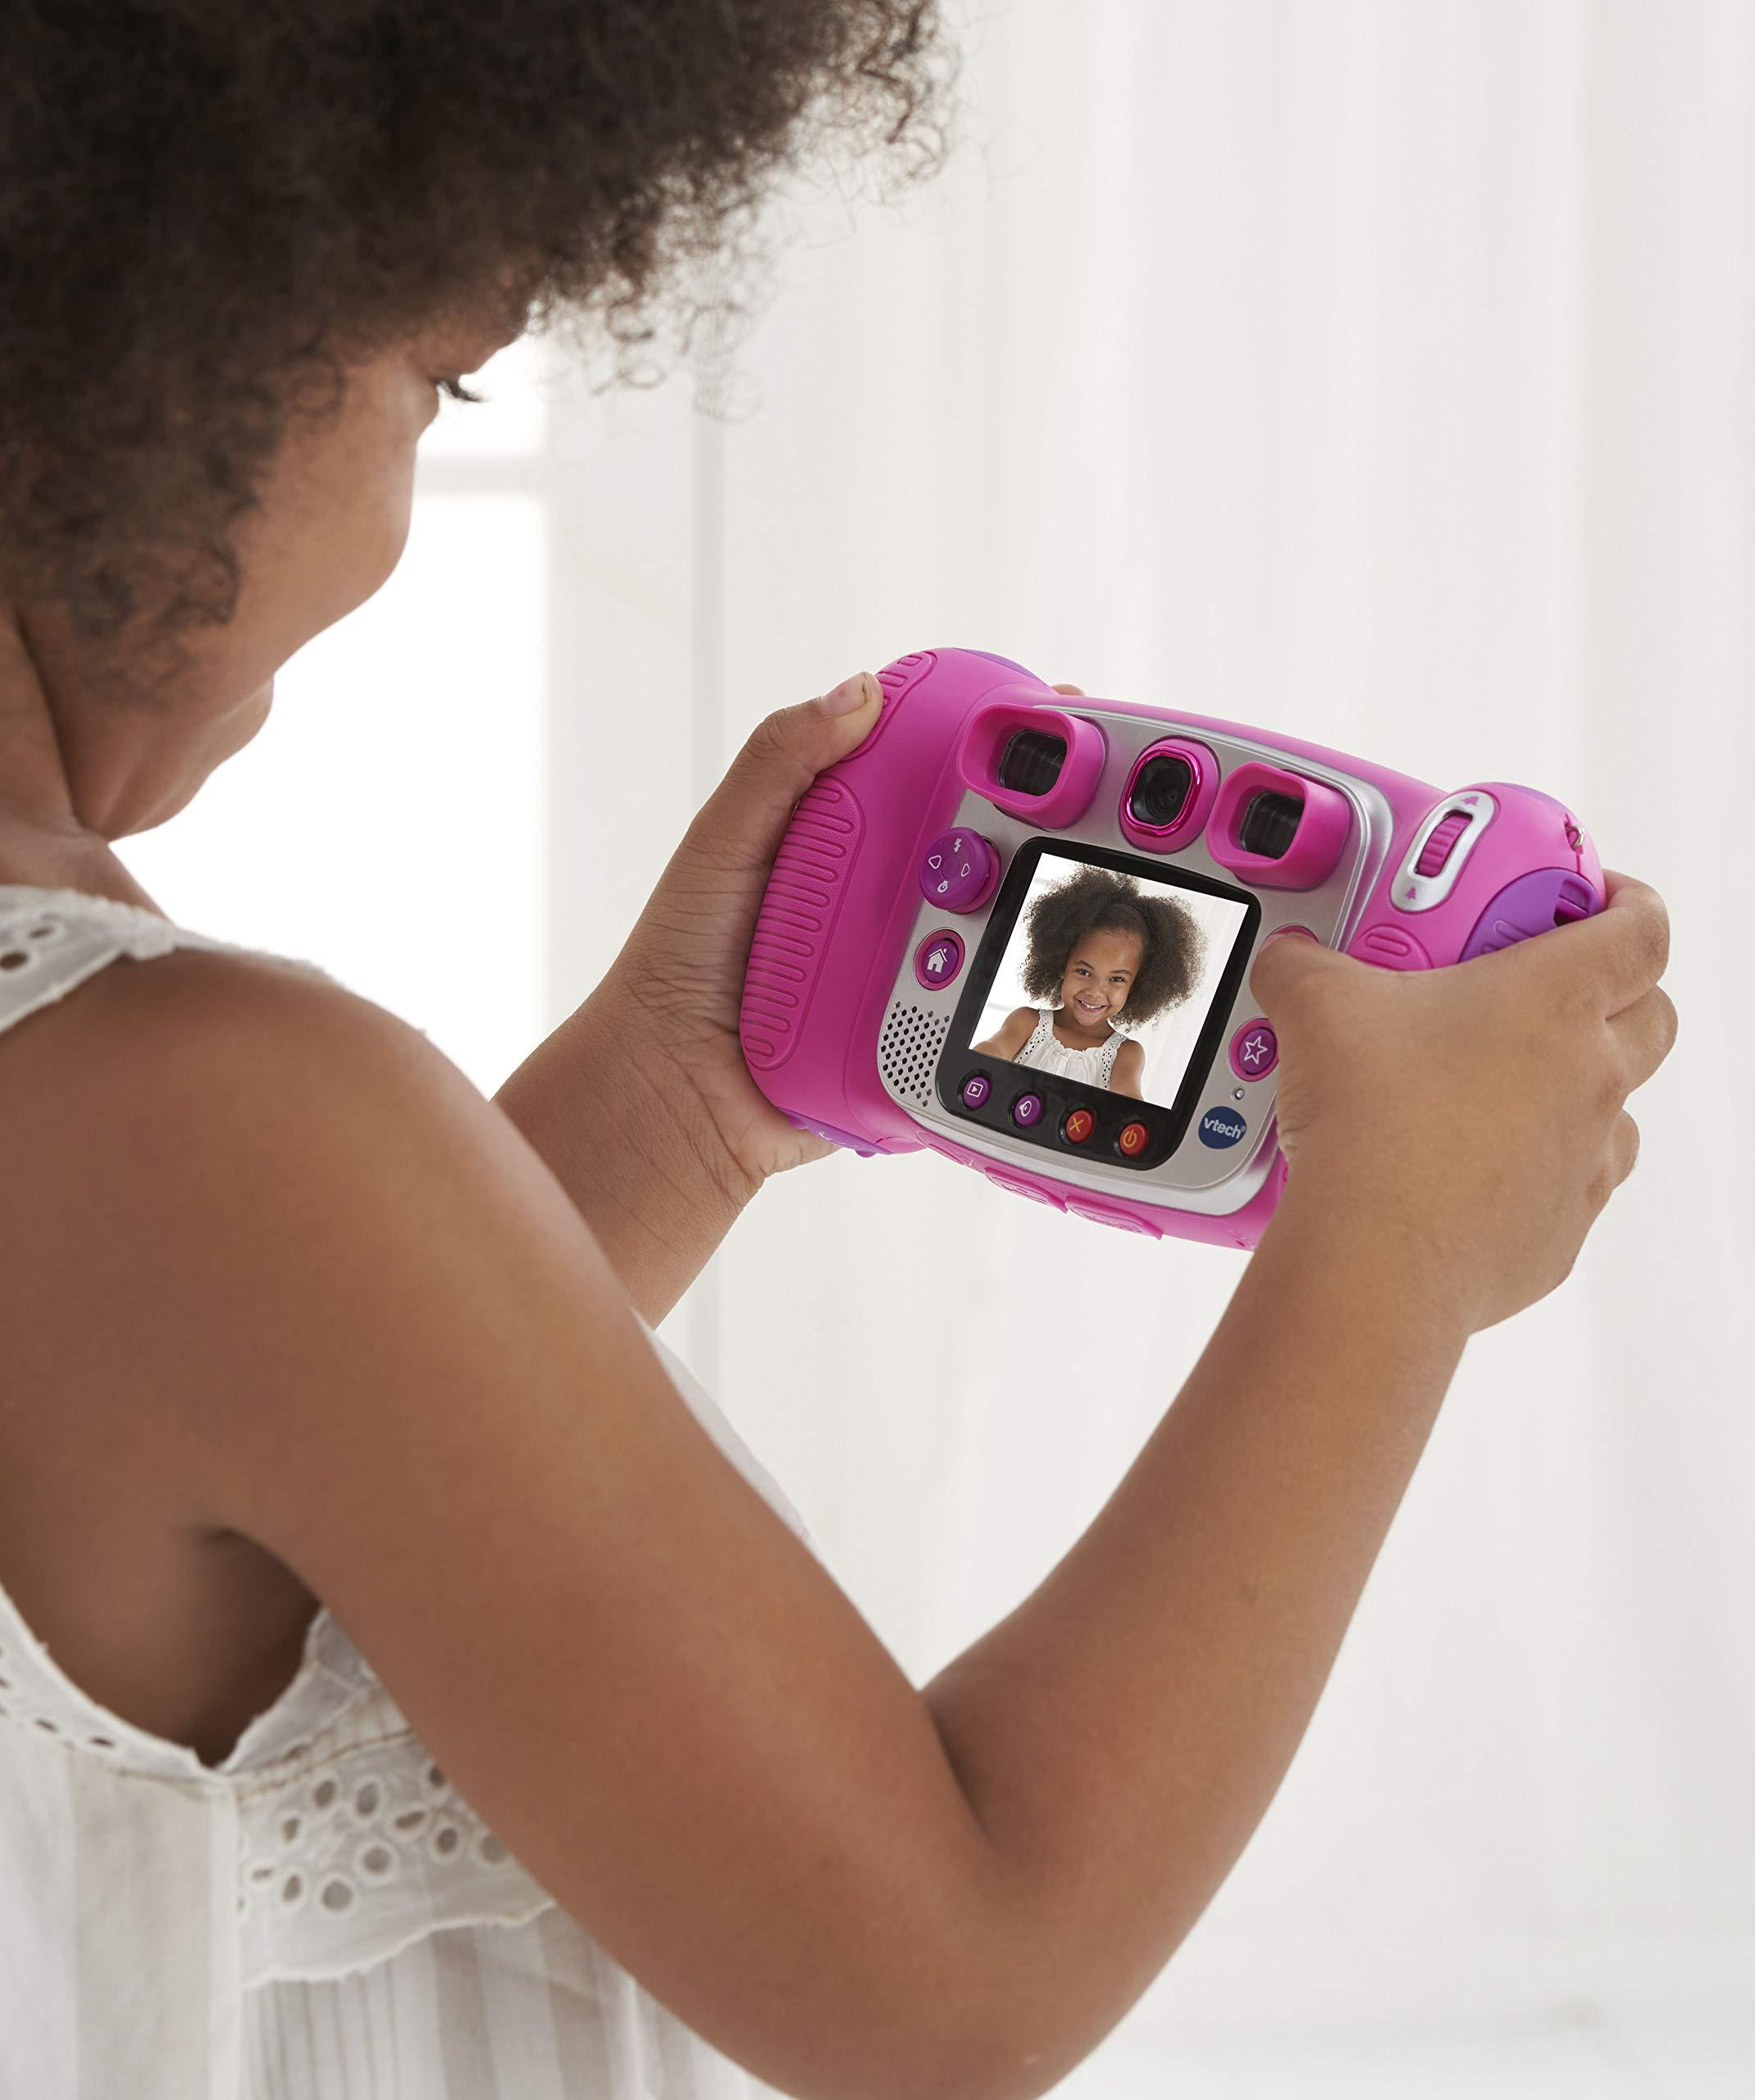 VTech Kidizoom Duo 5.0 Camera Pink by VTech (Image #6)